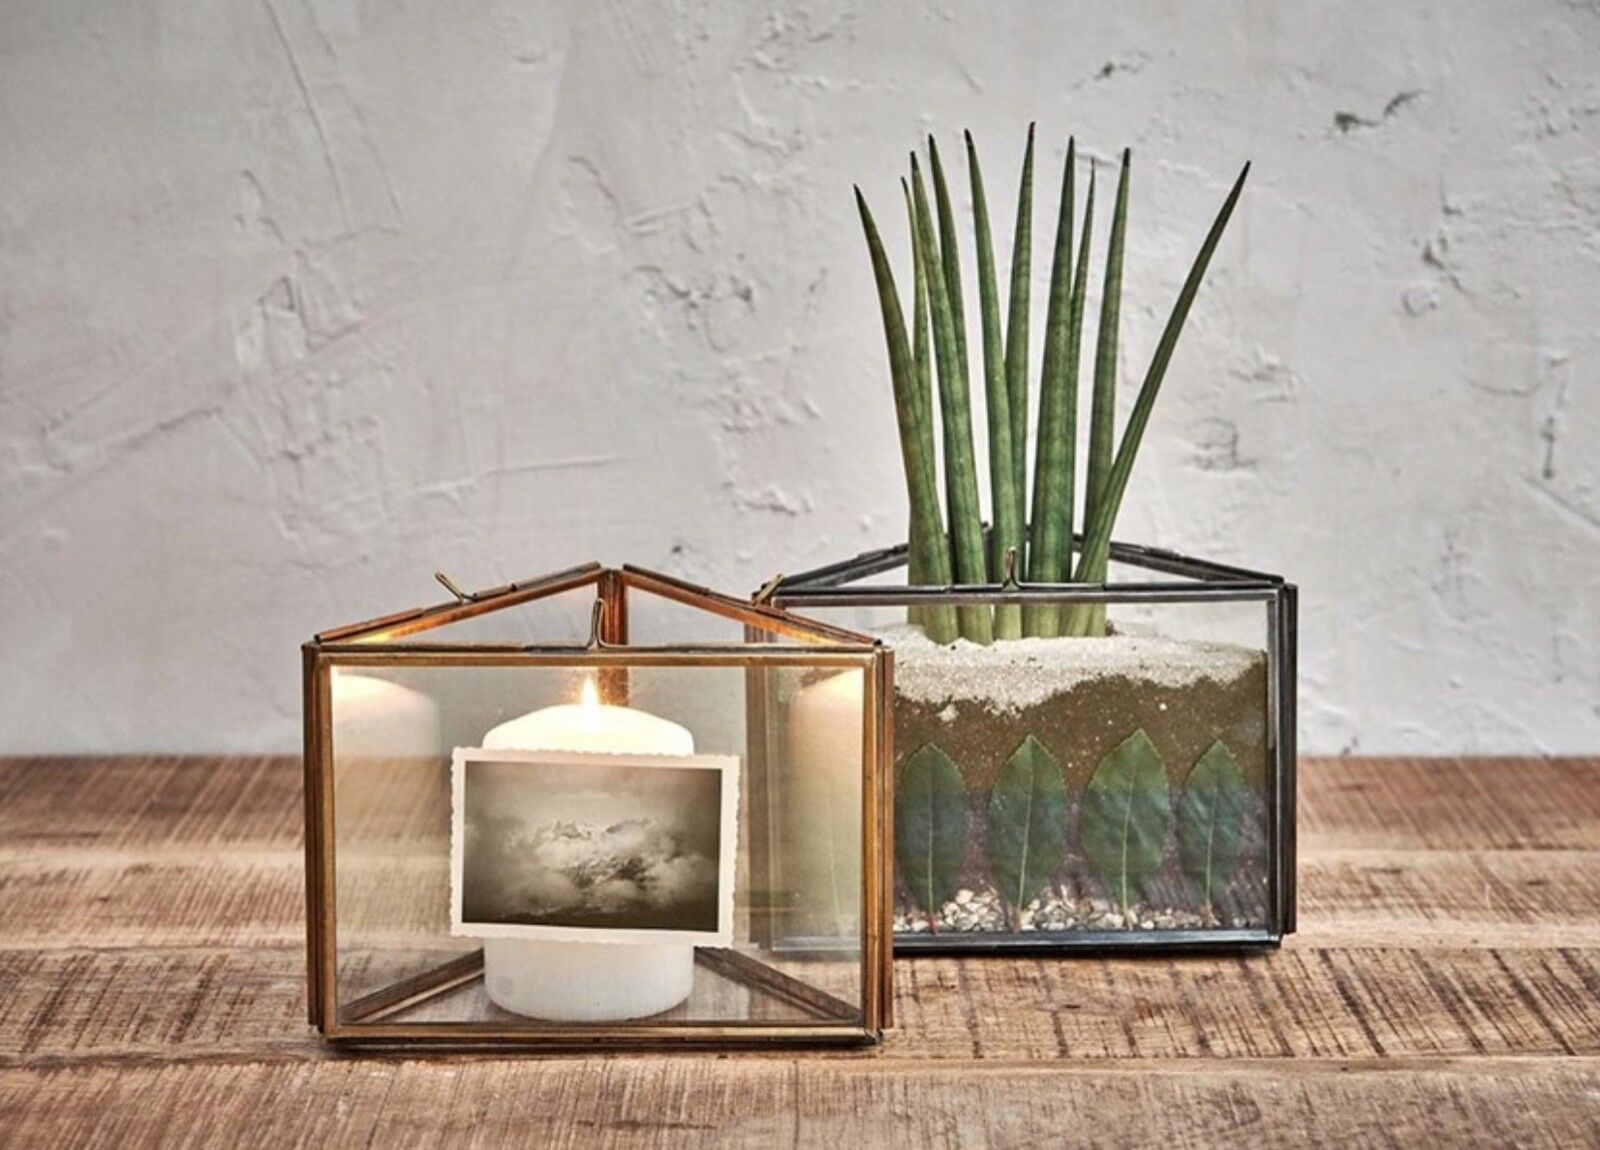 3 Frame Gold Brass Triangle Picture Photo Candle Holder Planter Danta Nkuku